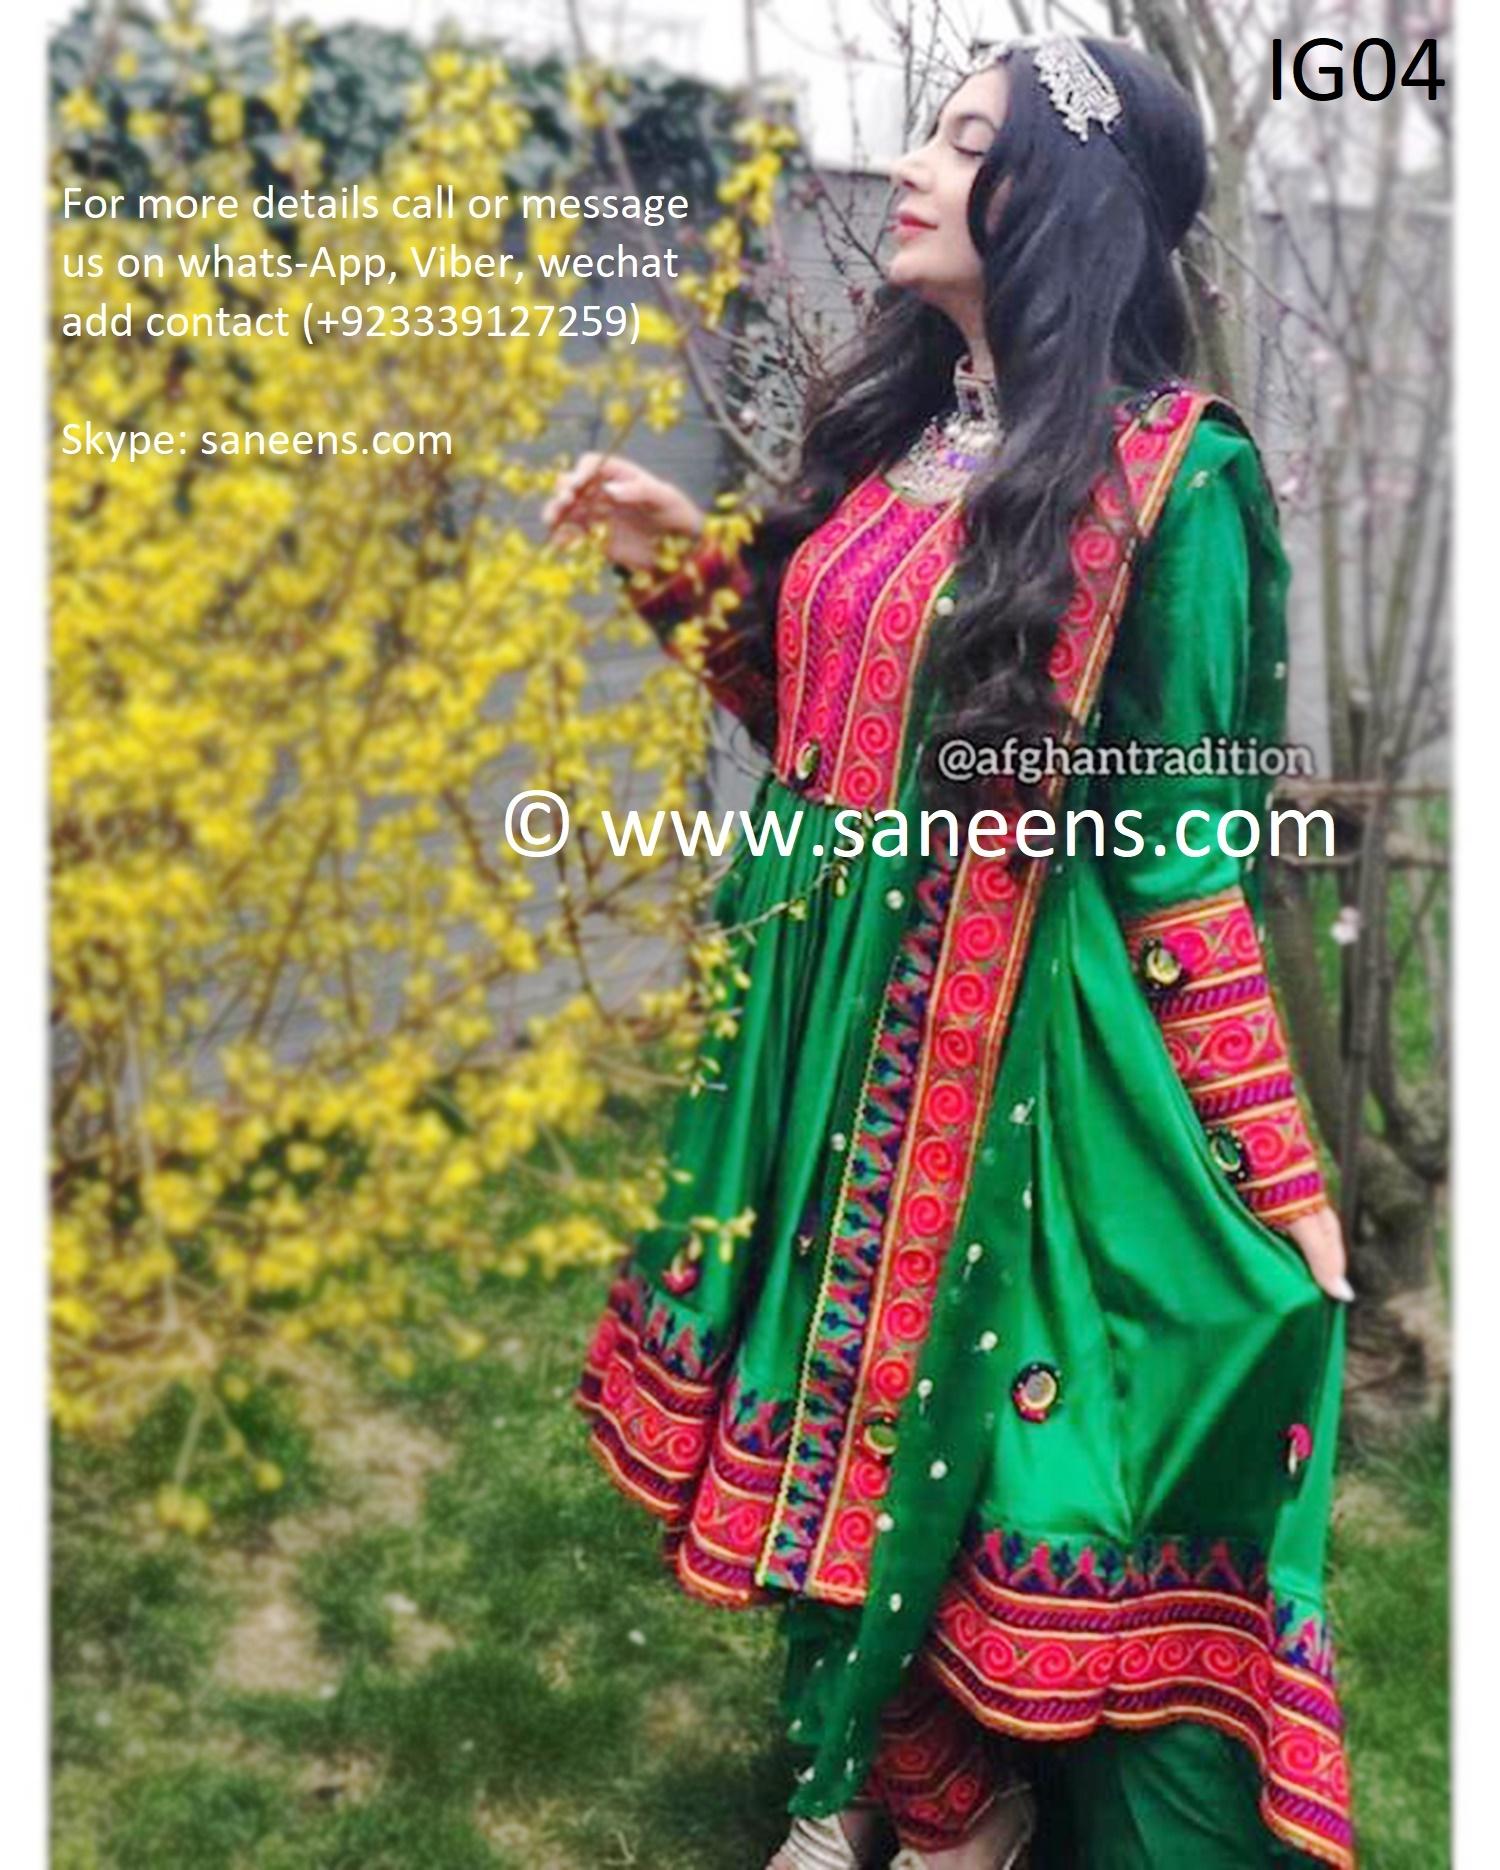 afghan-tradition-1-.jpg